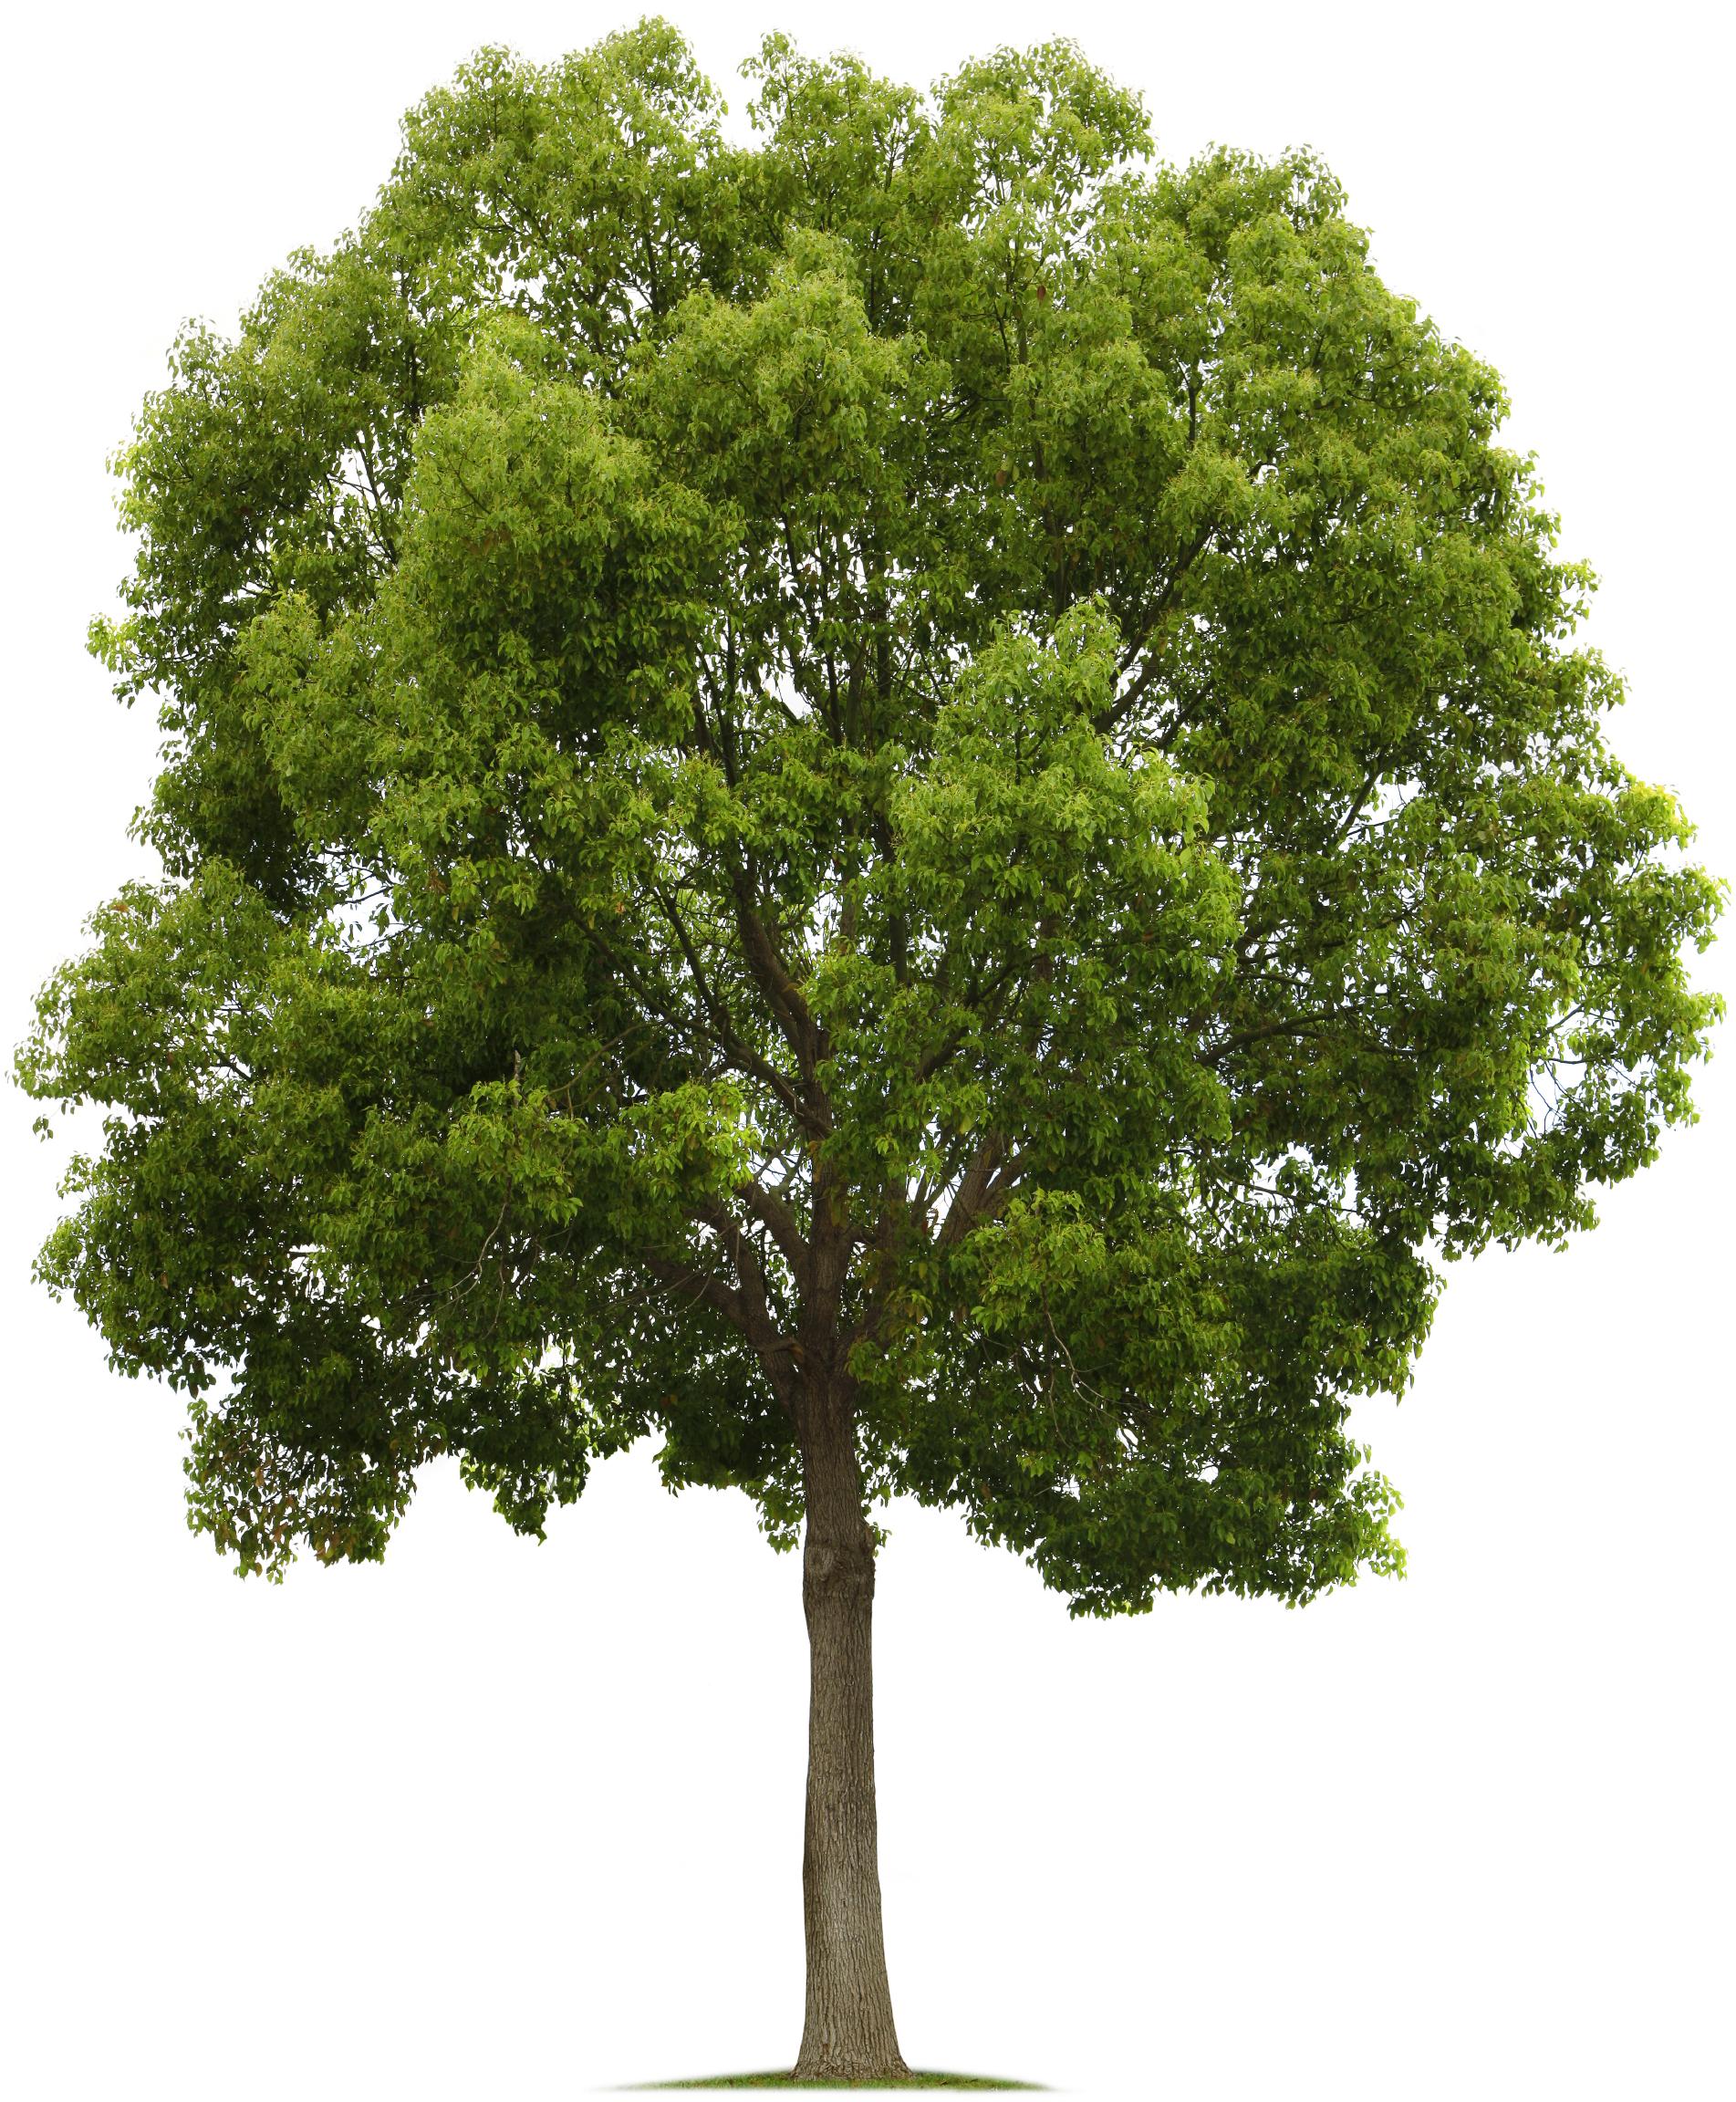 Gambar Pohon Png : gambar, pohon, Tree.png, (1903×2304), Tanaman,, Pohon,, Gambar